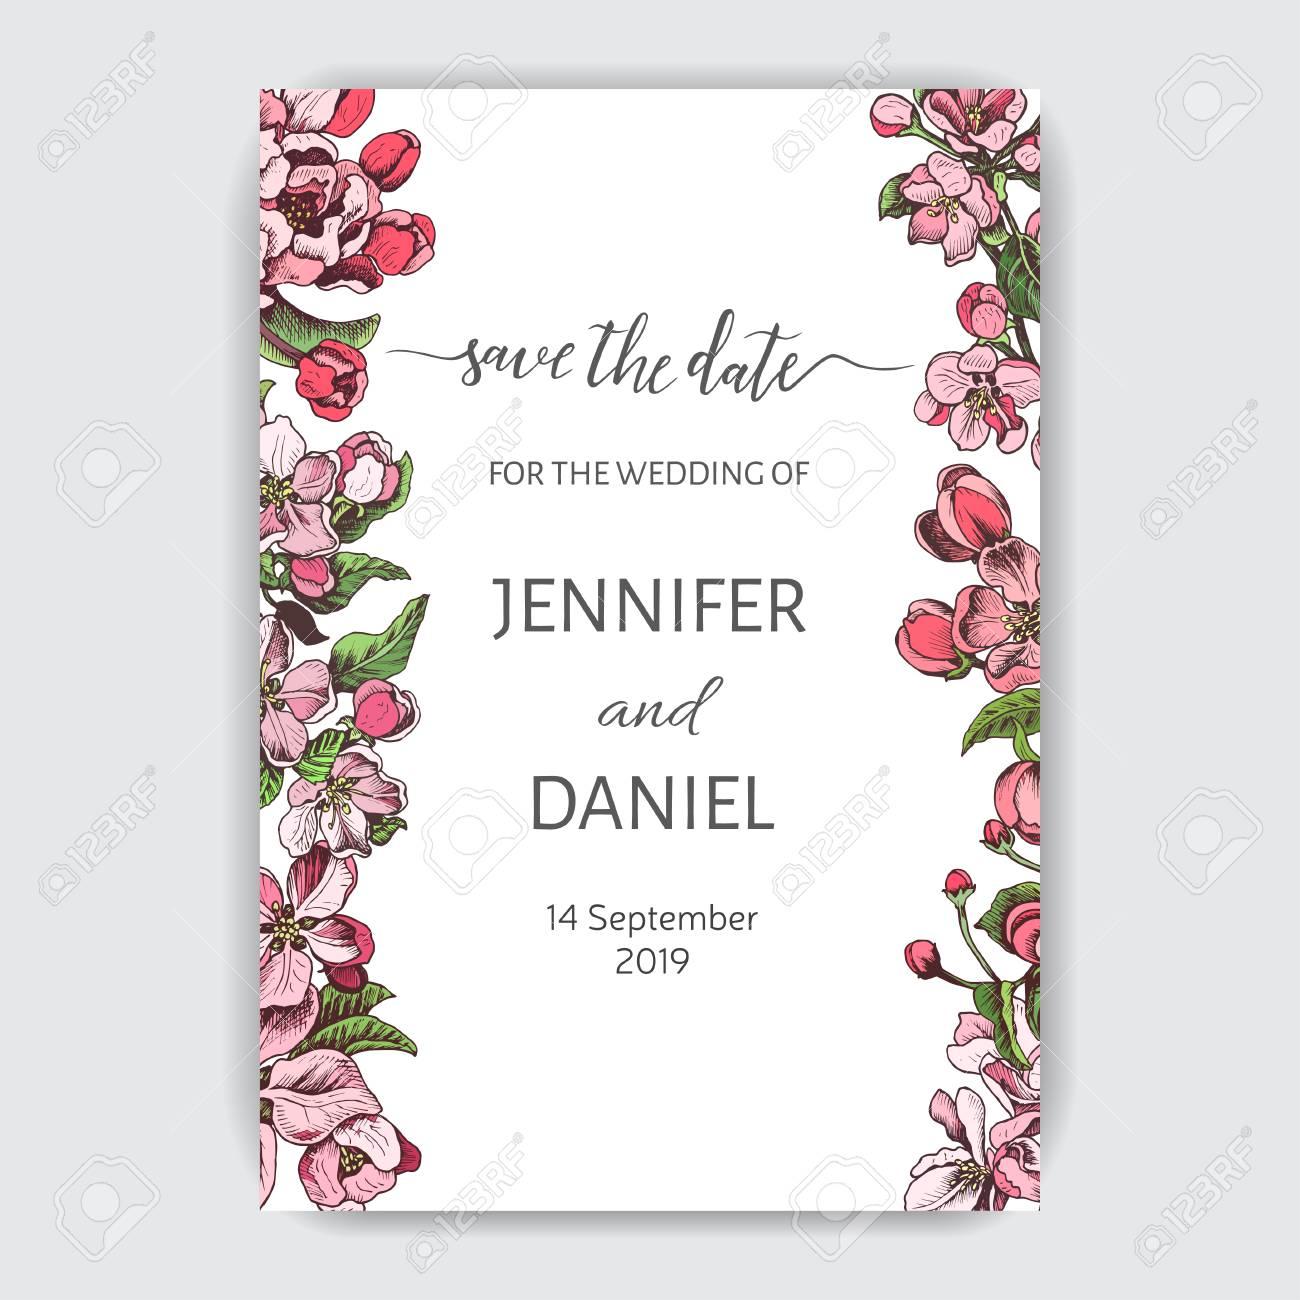 Template For Wedding Invitation Card Vector Illustration Apple